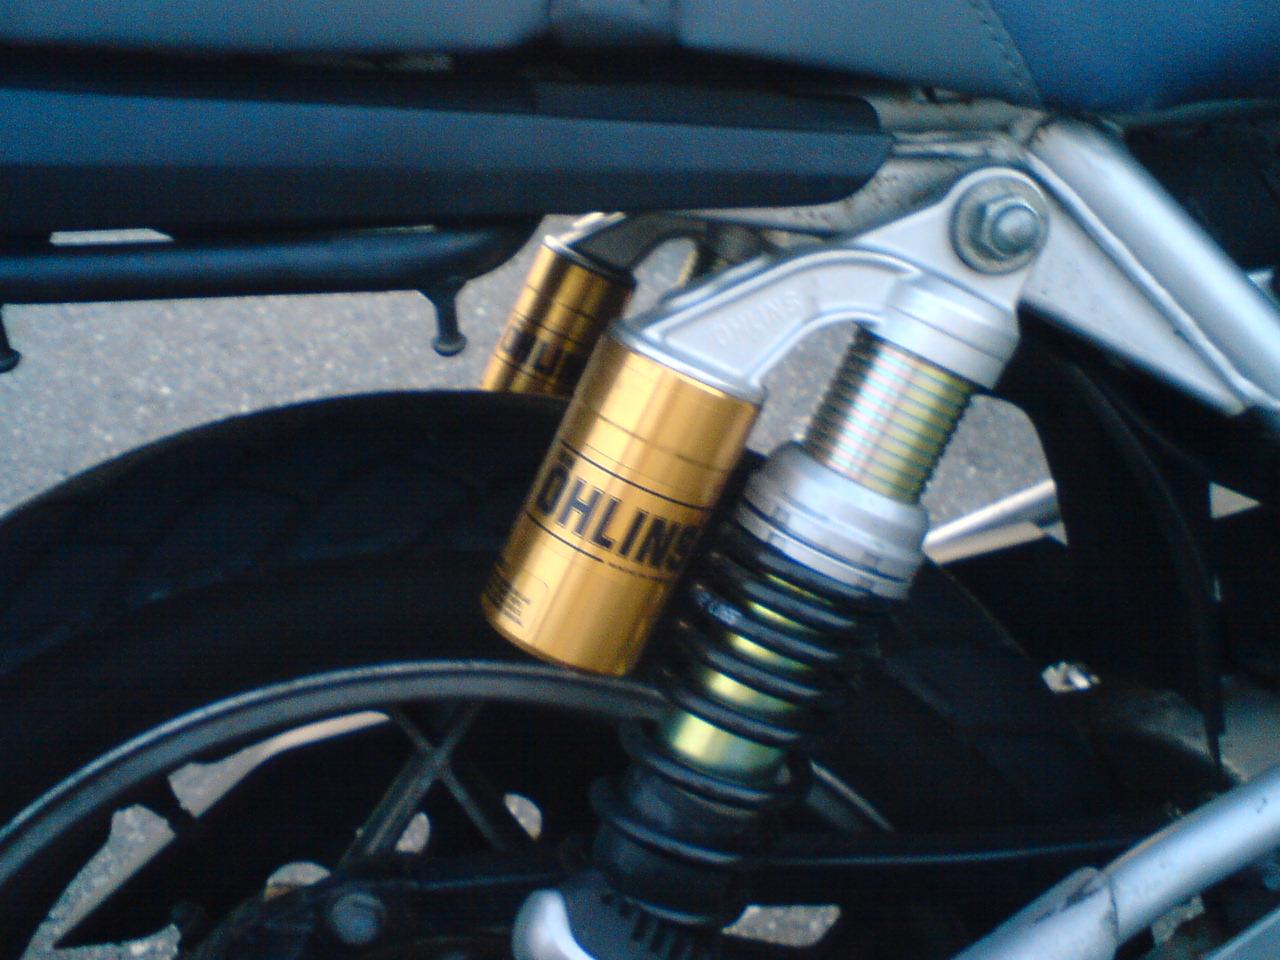 GSX400S KATANA (カタナ)オーリンズ 車高調キットの単体画像